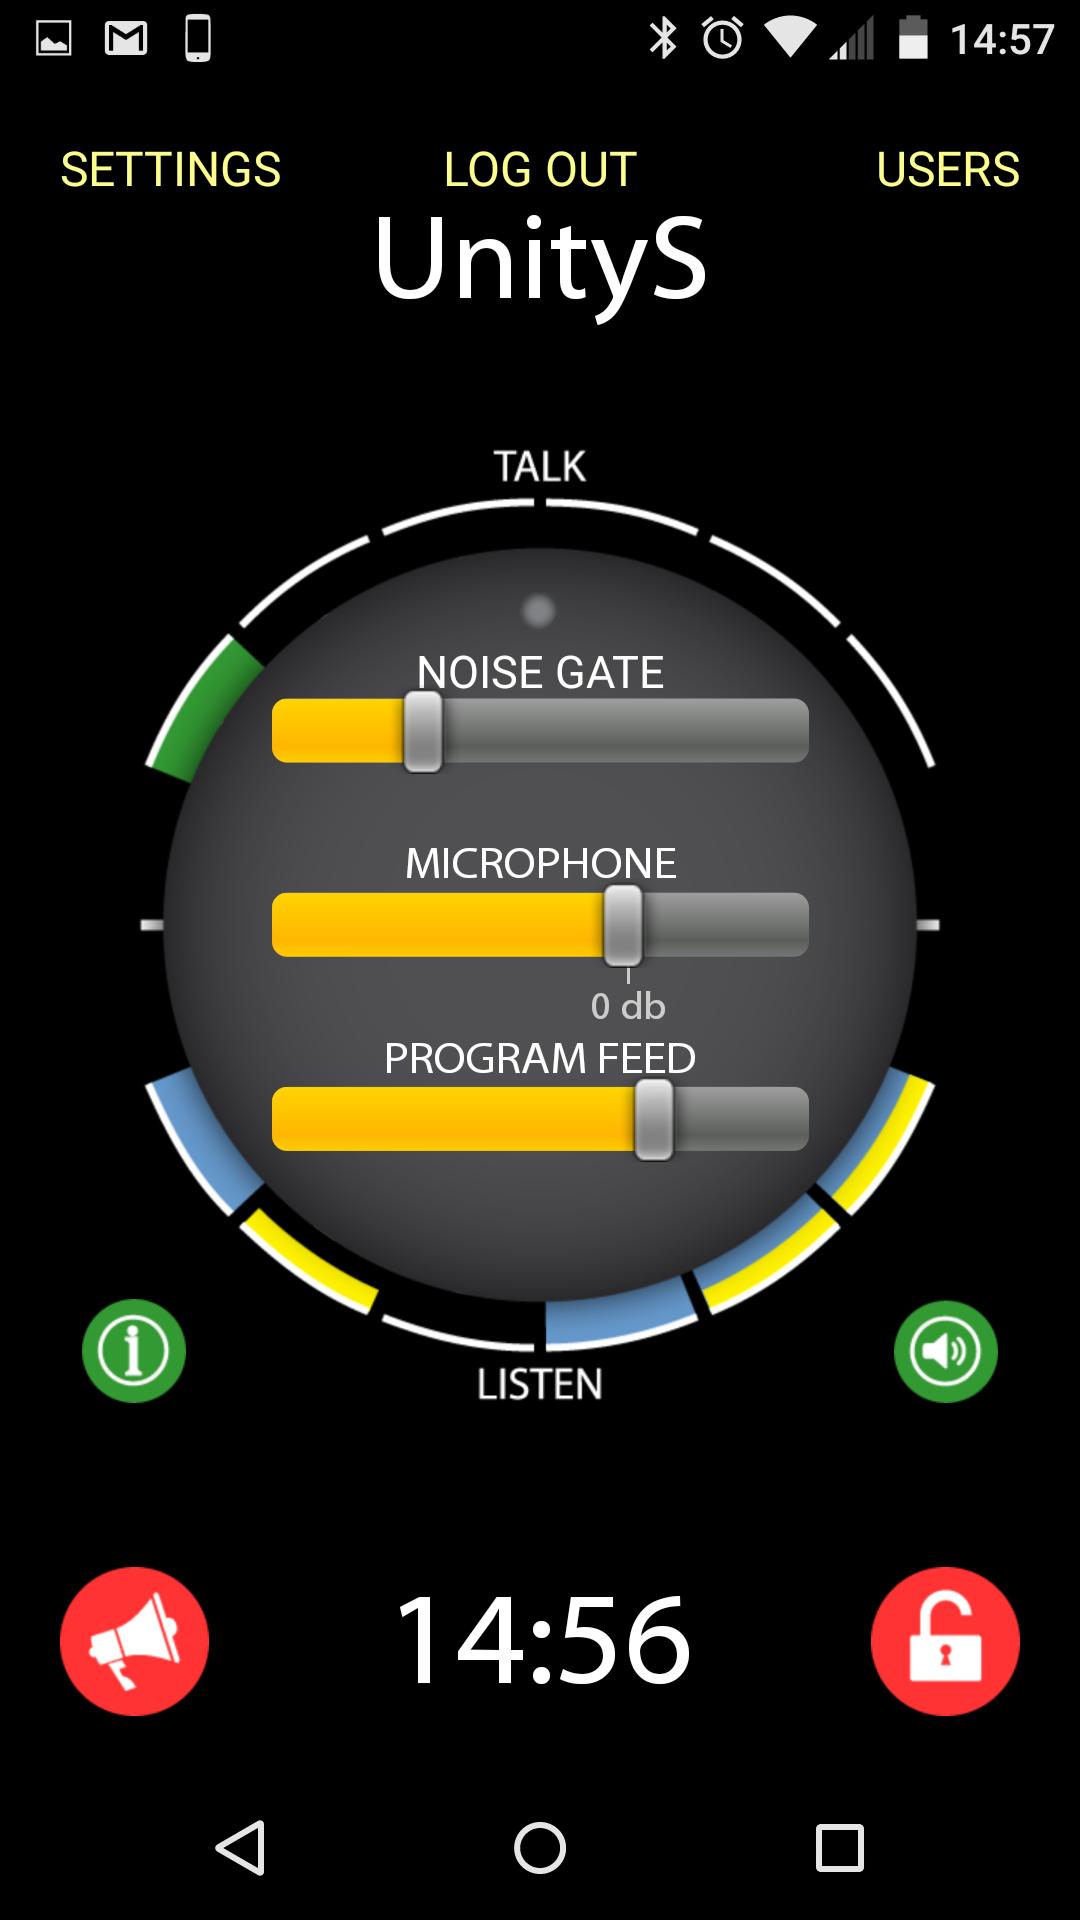 Noise Gate Adjustment